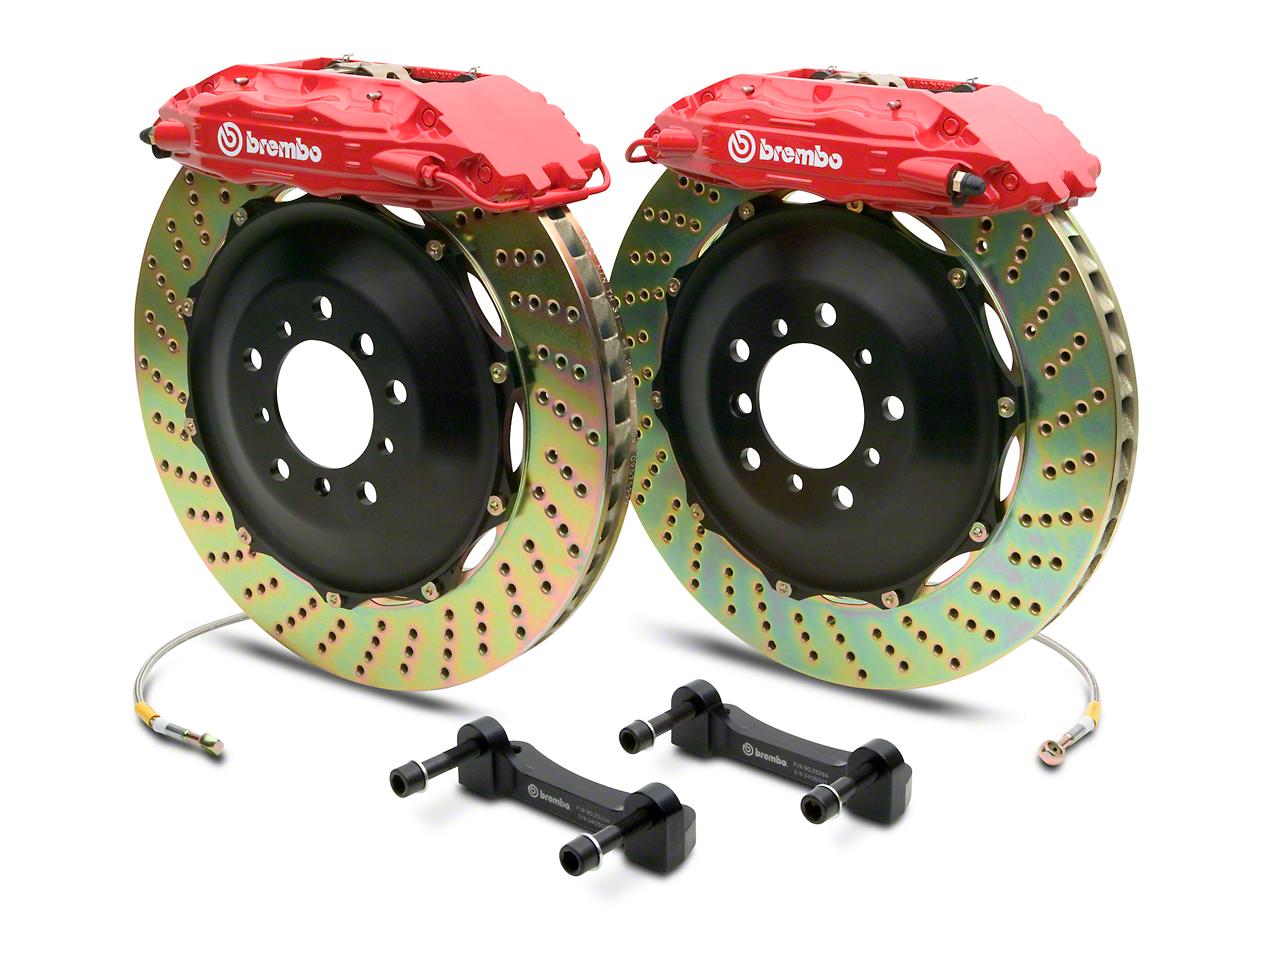 Brembo GT Series 4-Piston Rear Brake Kit - 2-Piece Cross Drilled Rotors - Red (14-18 Silverado 1500)